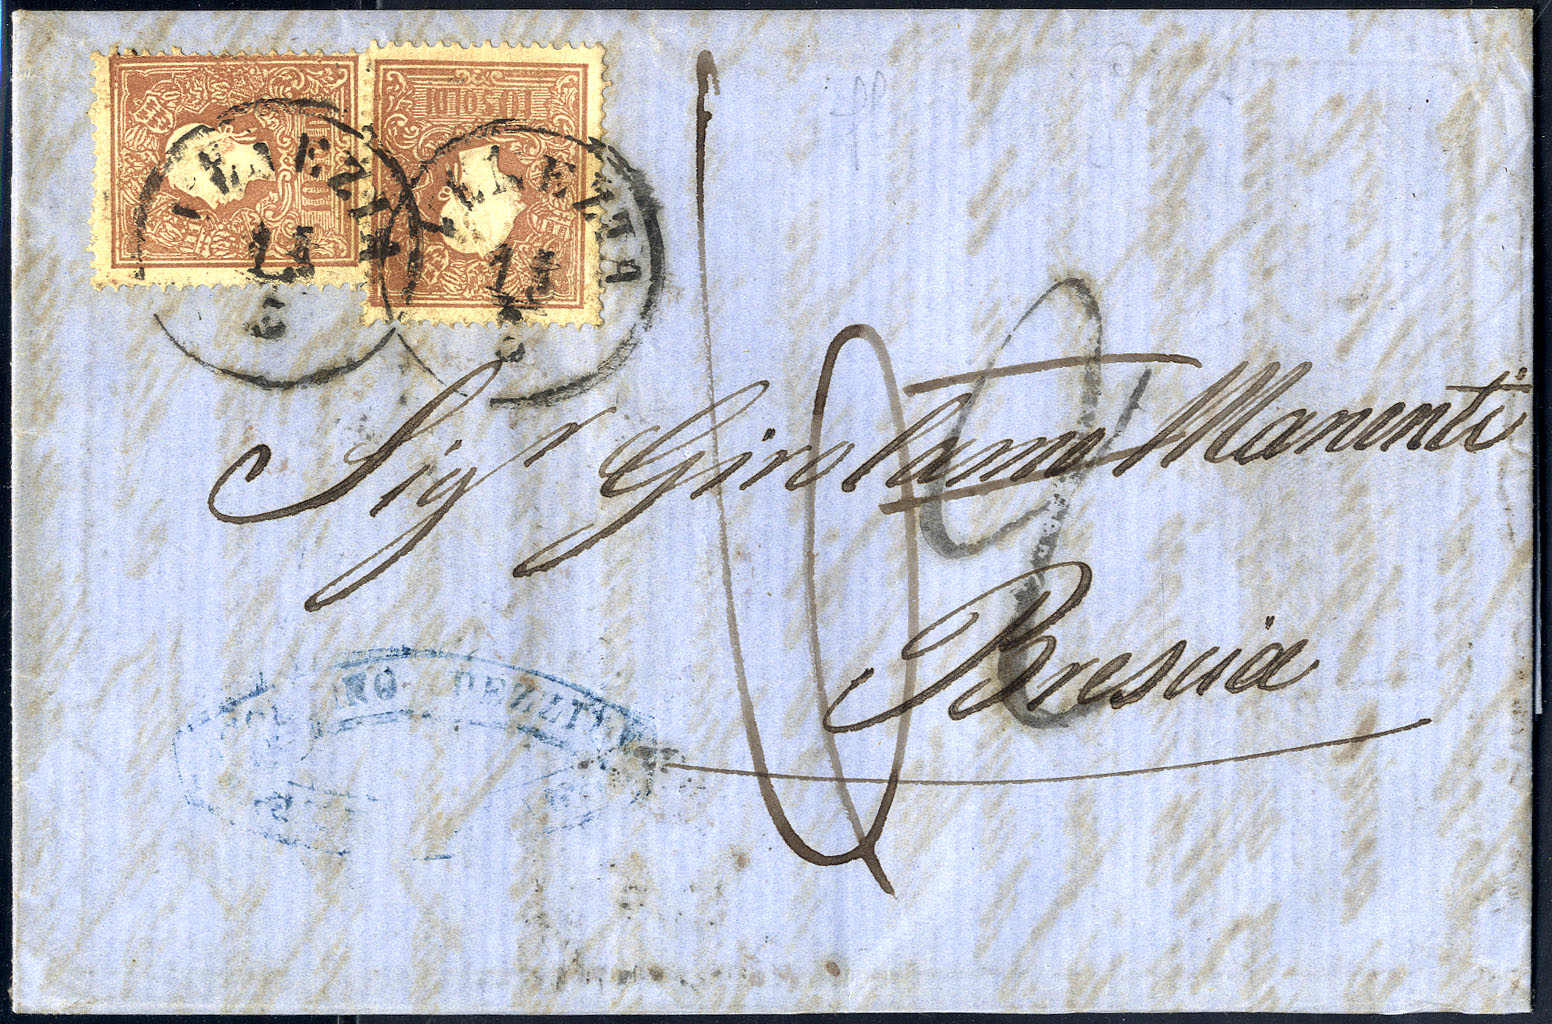 Lot 1581 - europe lombardy venetia -  Viennafil Auktionen 63rd LIVE AUCTION